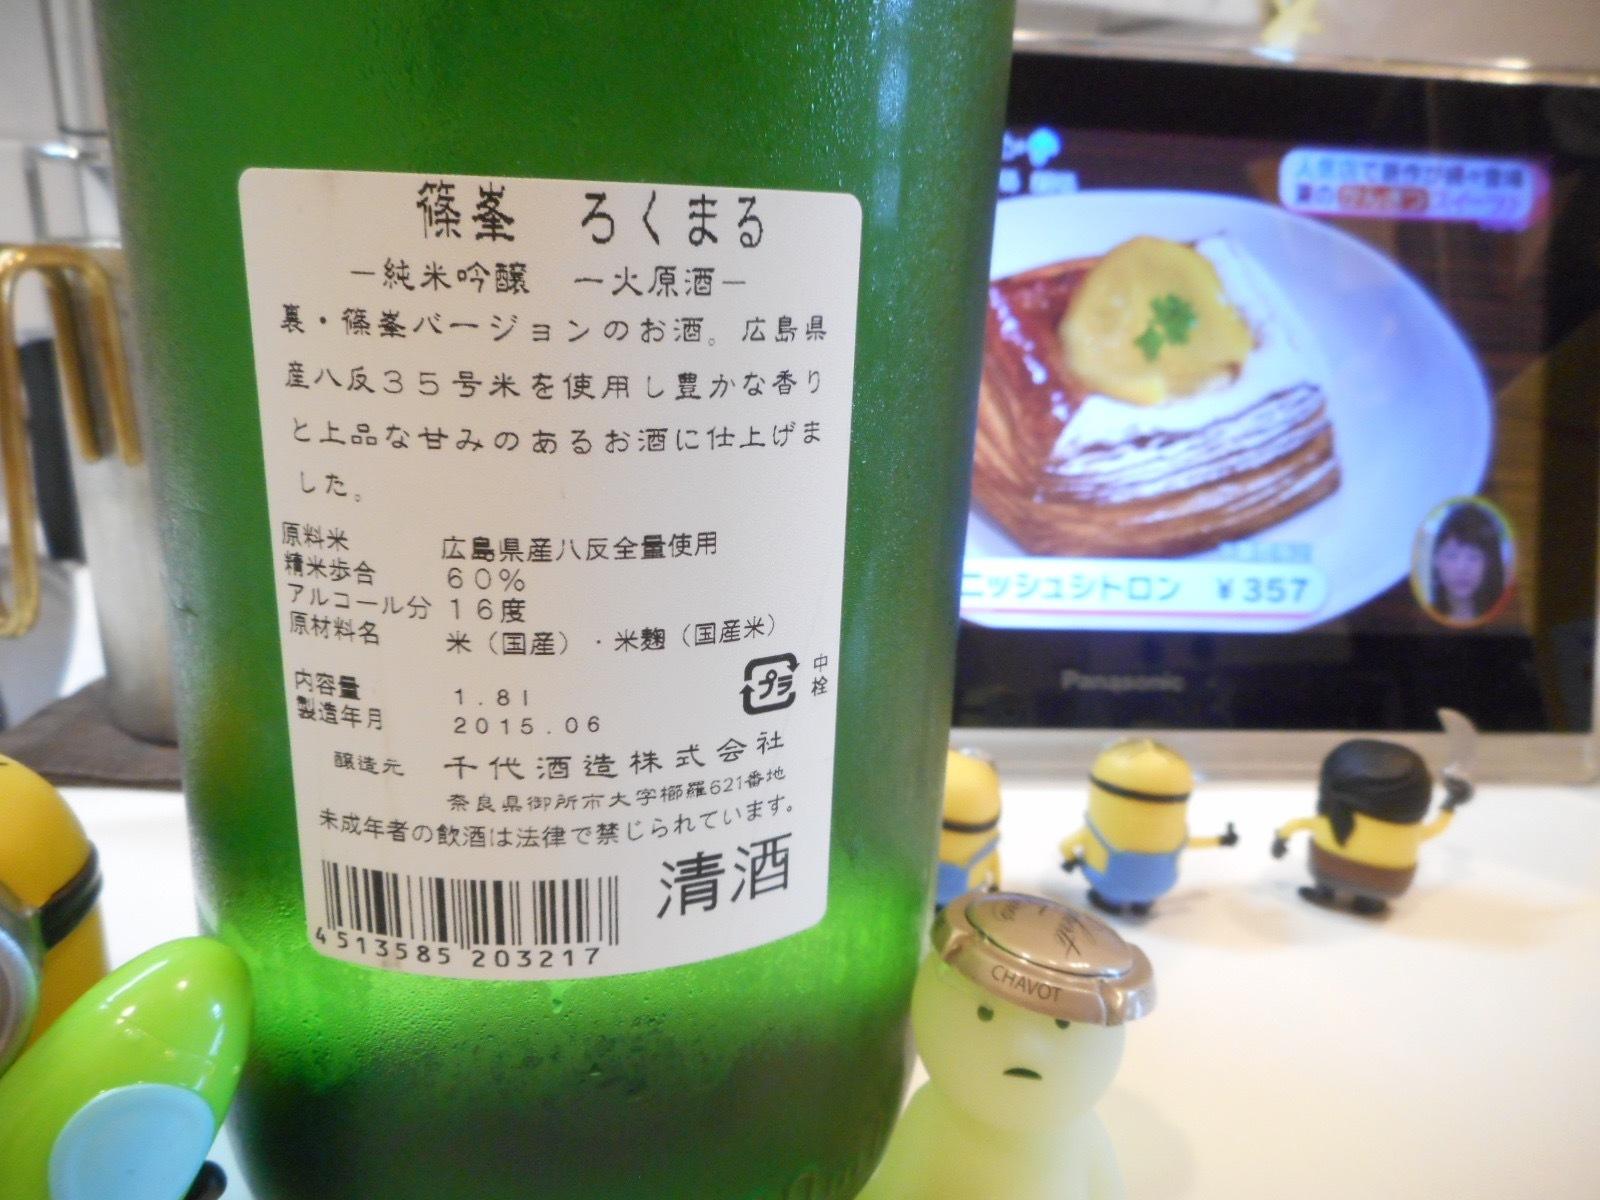 rokumaru_hattan_hiire26by2.jpg